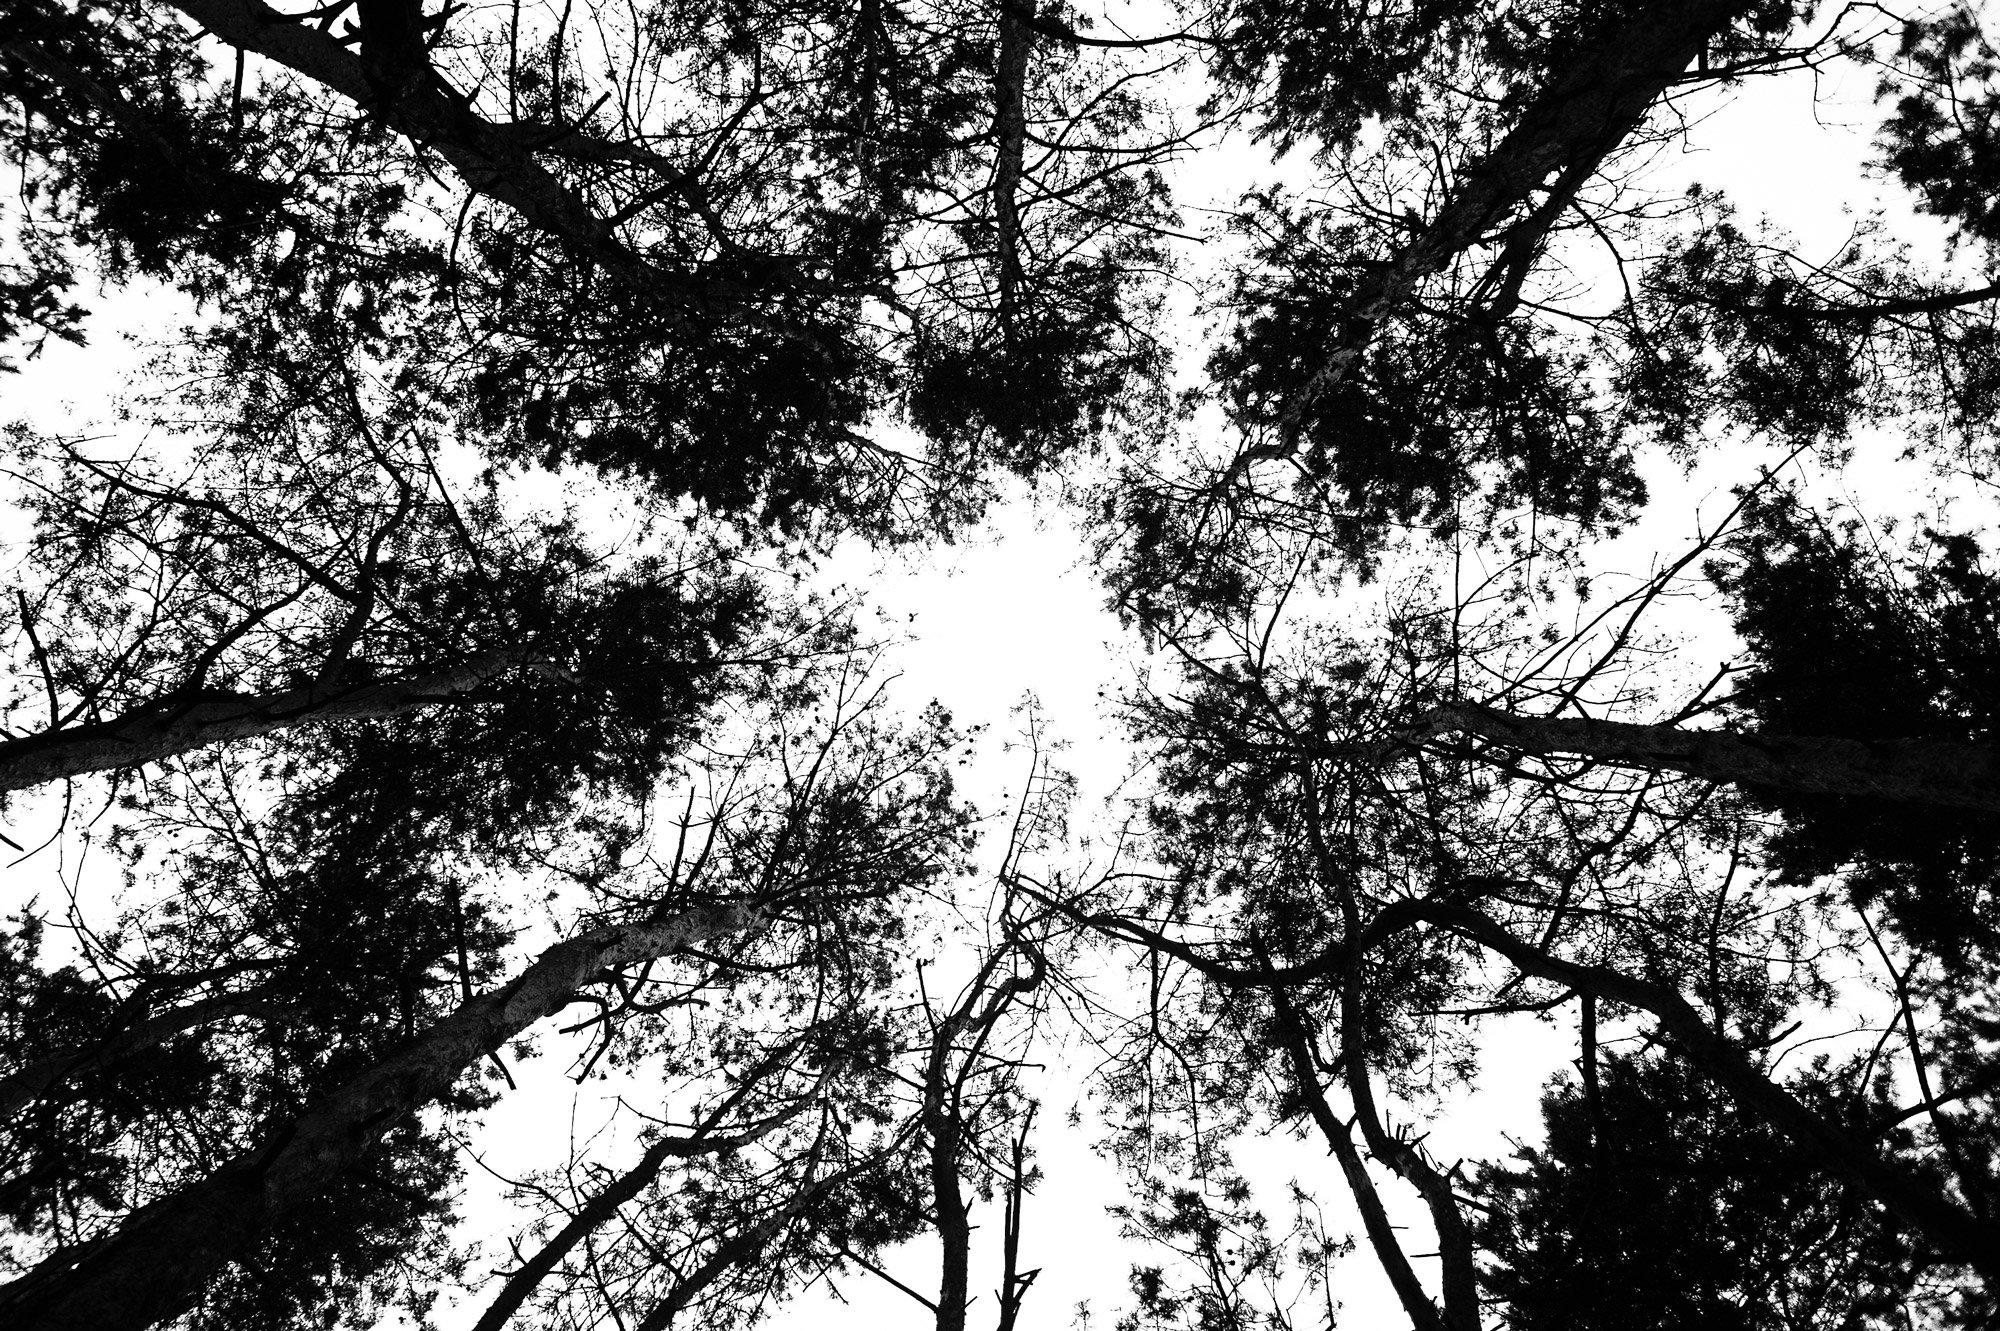 Black & white, Bw, Light, Nature, Trees, Андрей Лободин